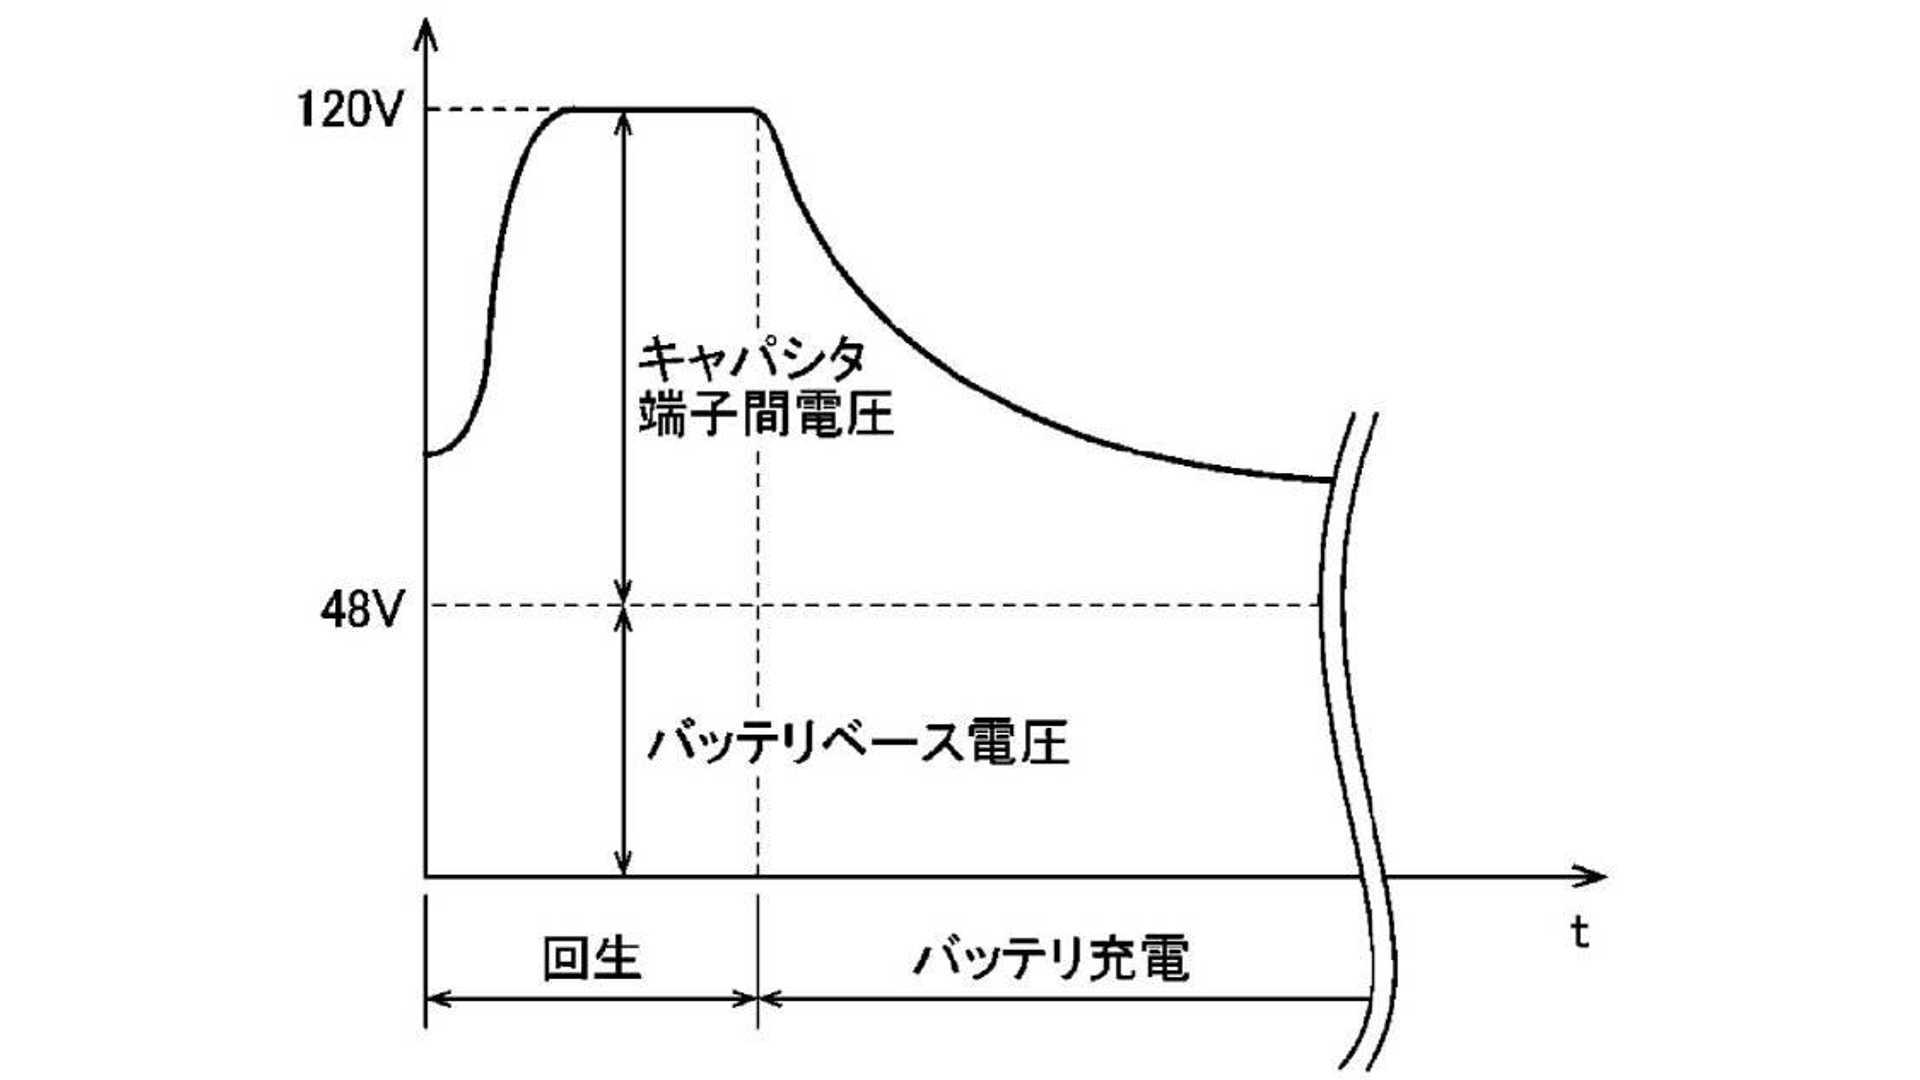 Mazda-Rotary-Engine-Hybrid-Patent-6